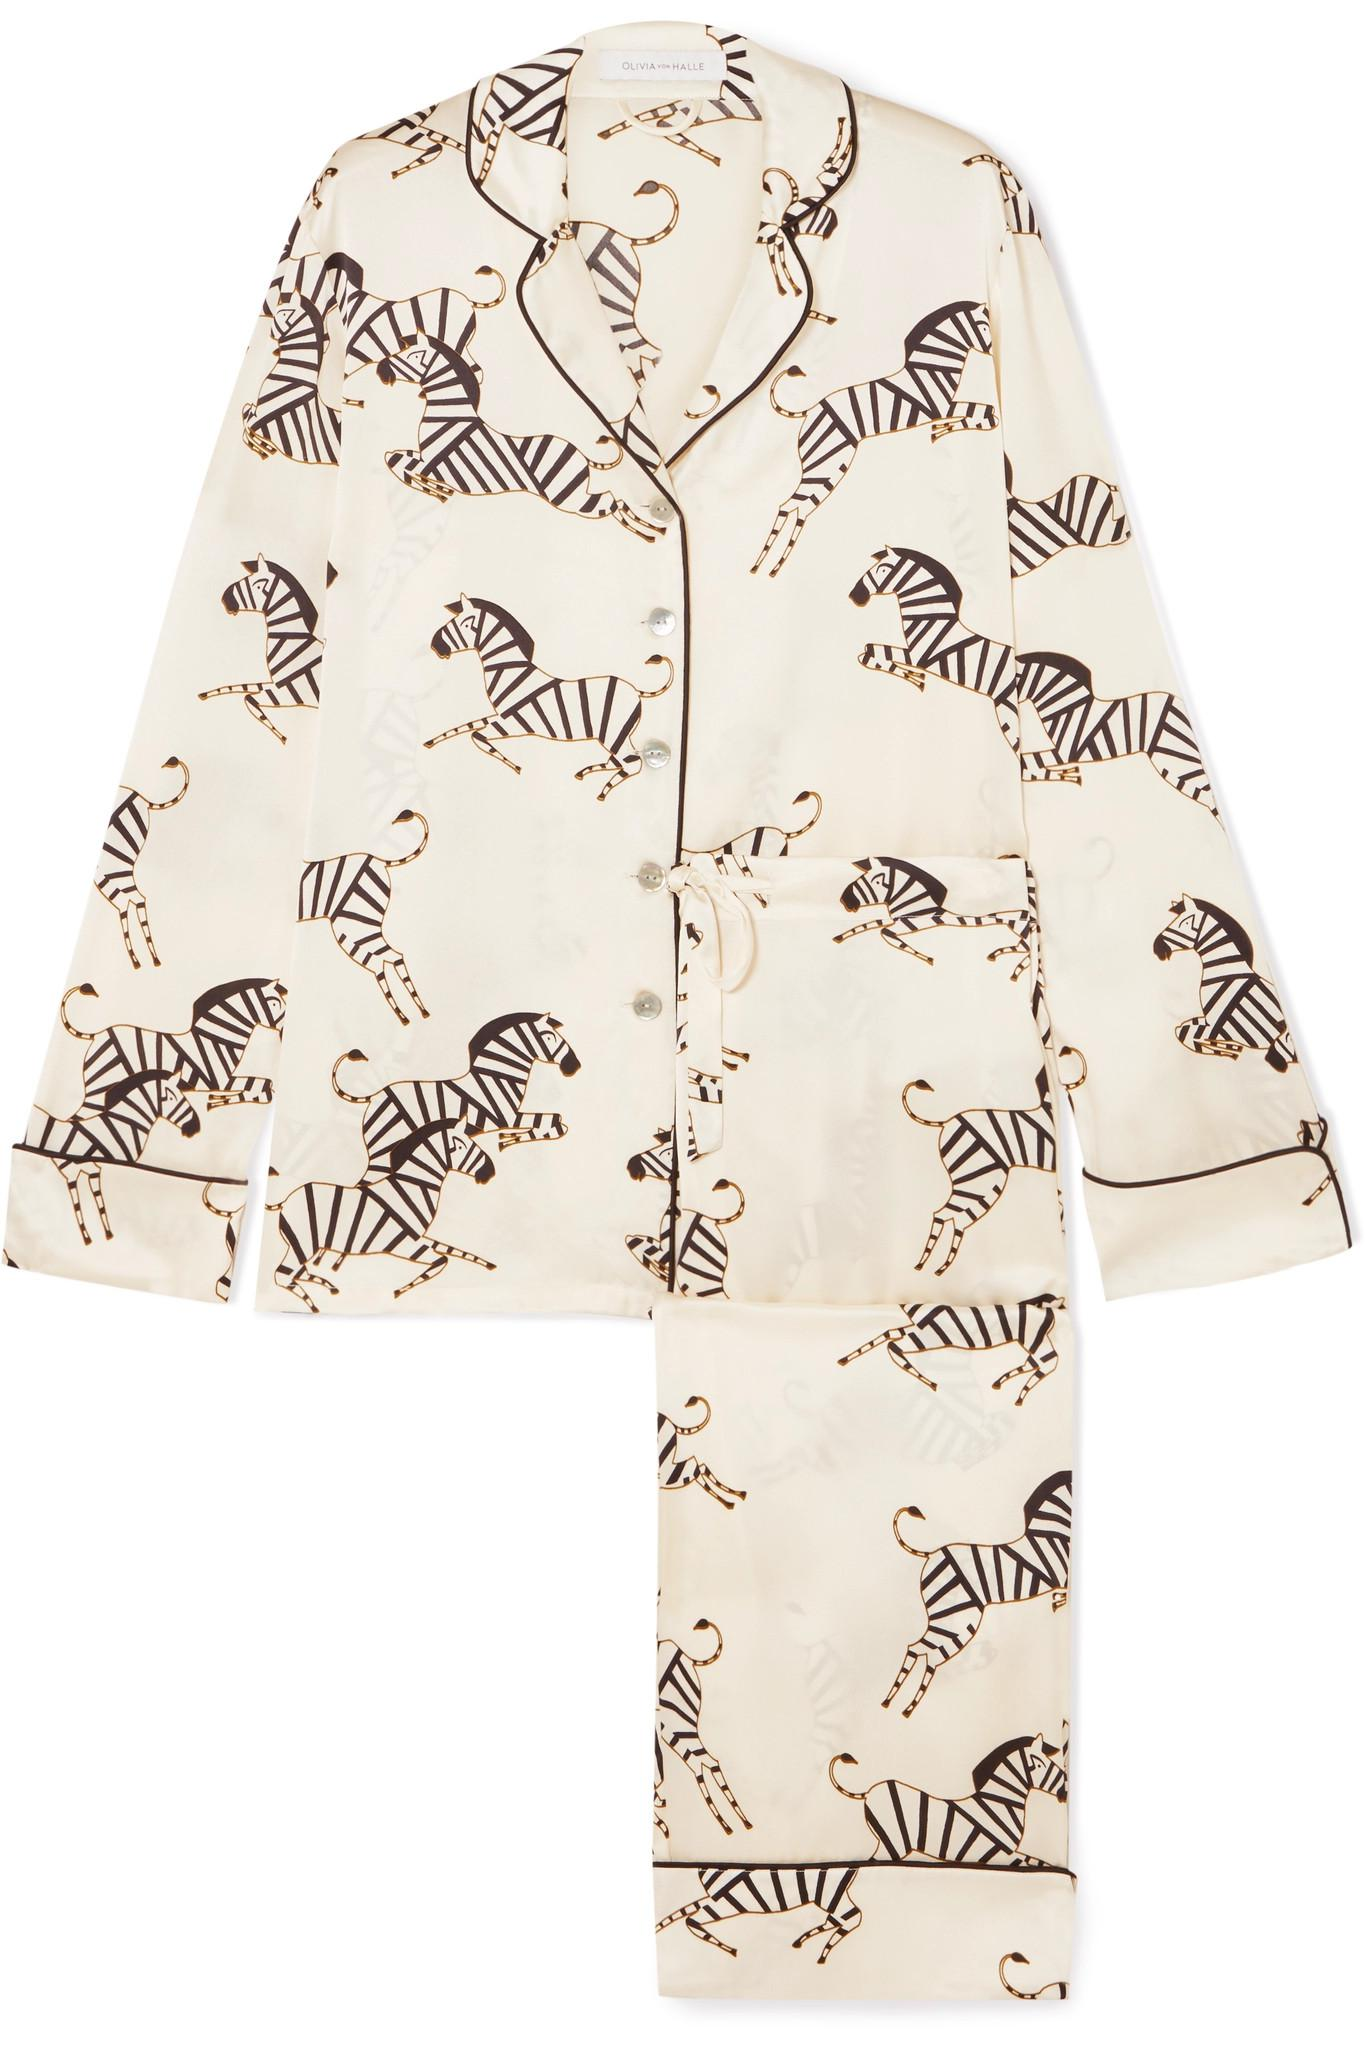 Lyst - Olivia Von Halle Lila Printed Silk-charmeuse Pajama Set in White 1789a42ad